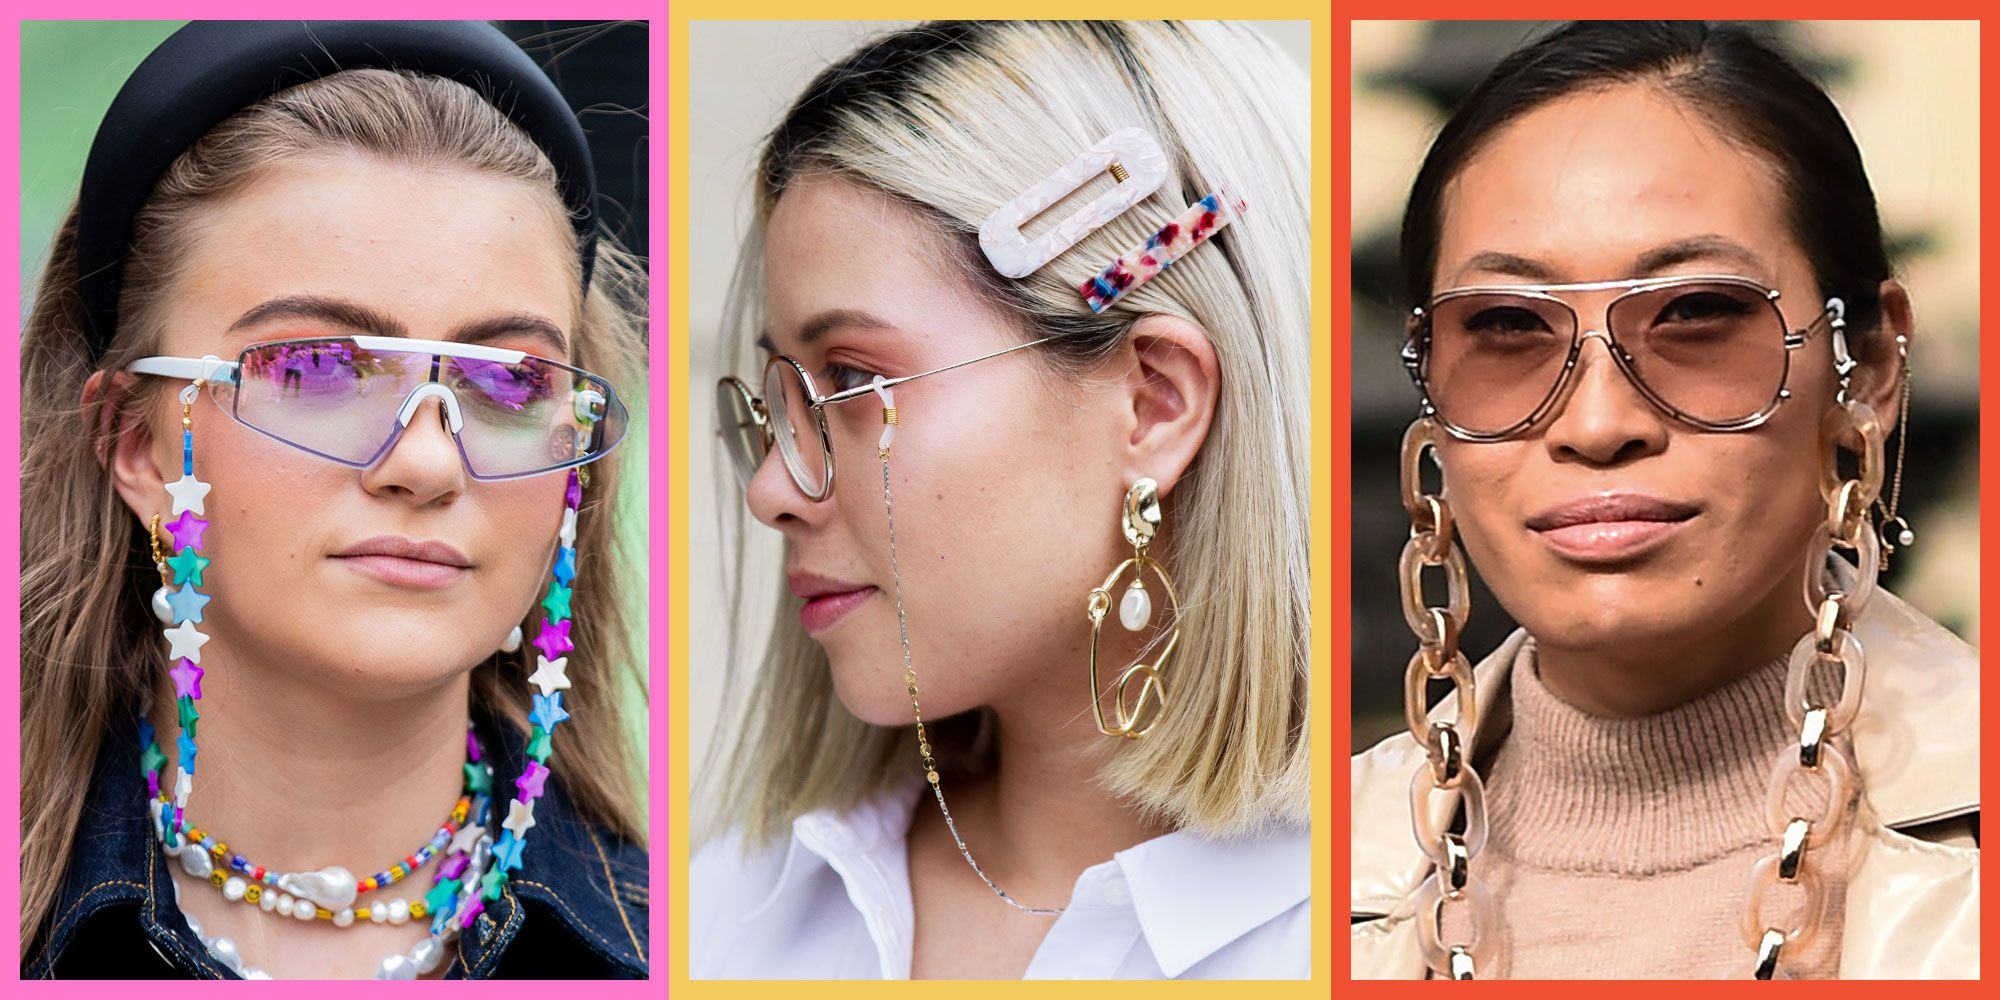 Glasses Chain Fashion Accessory Trend - Sunglasses Chains Fall 2019